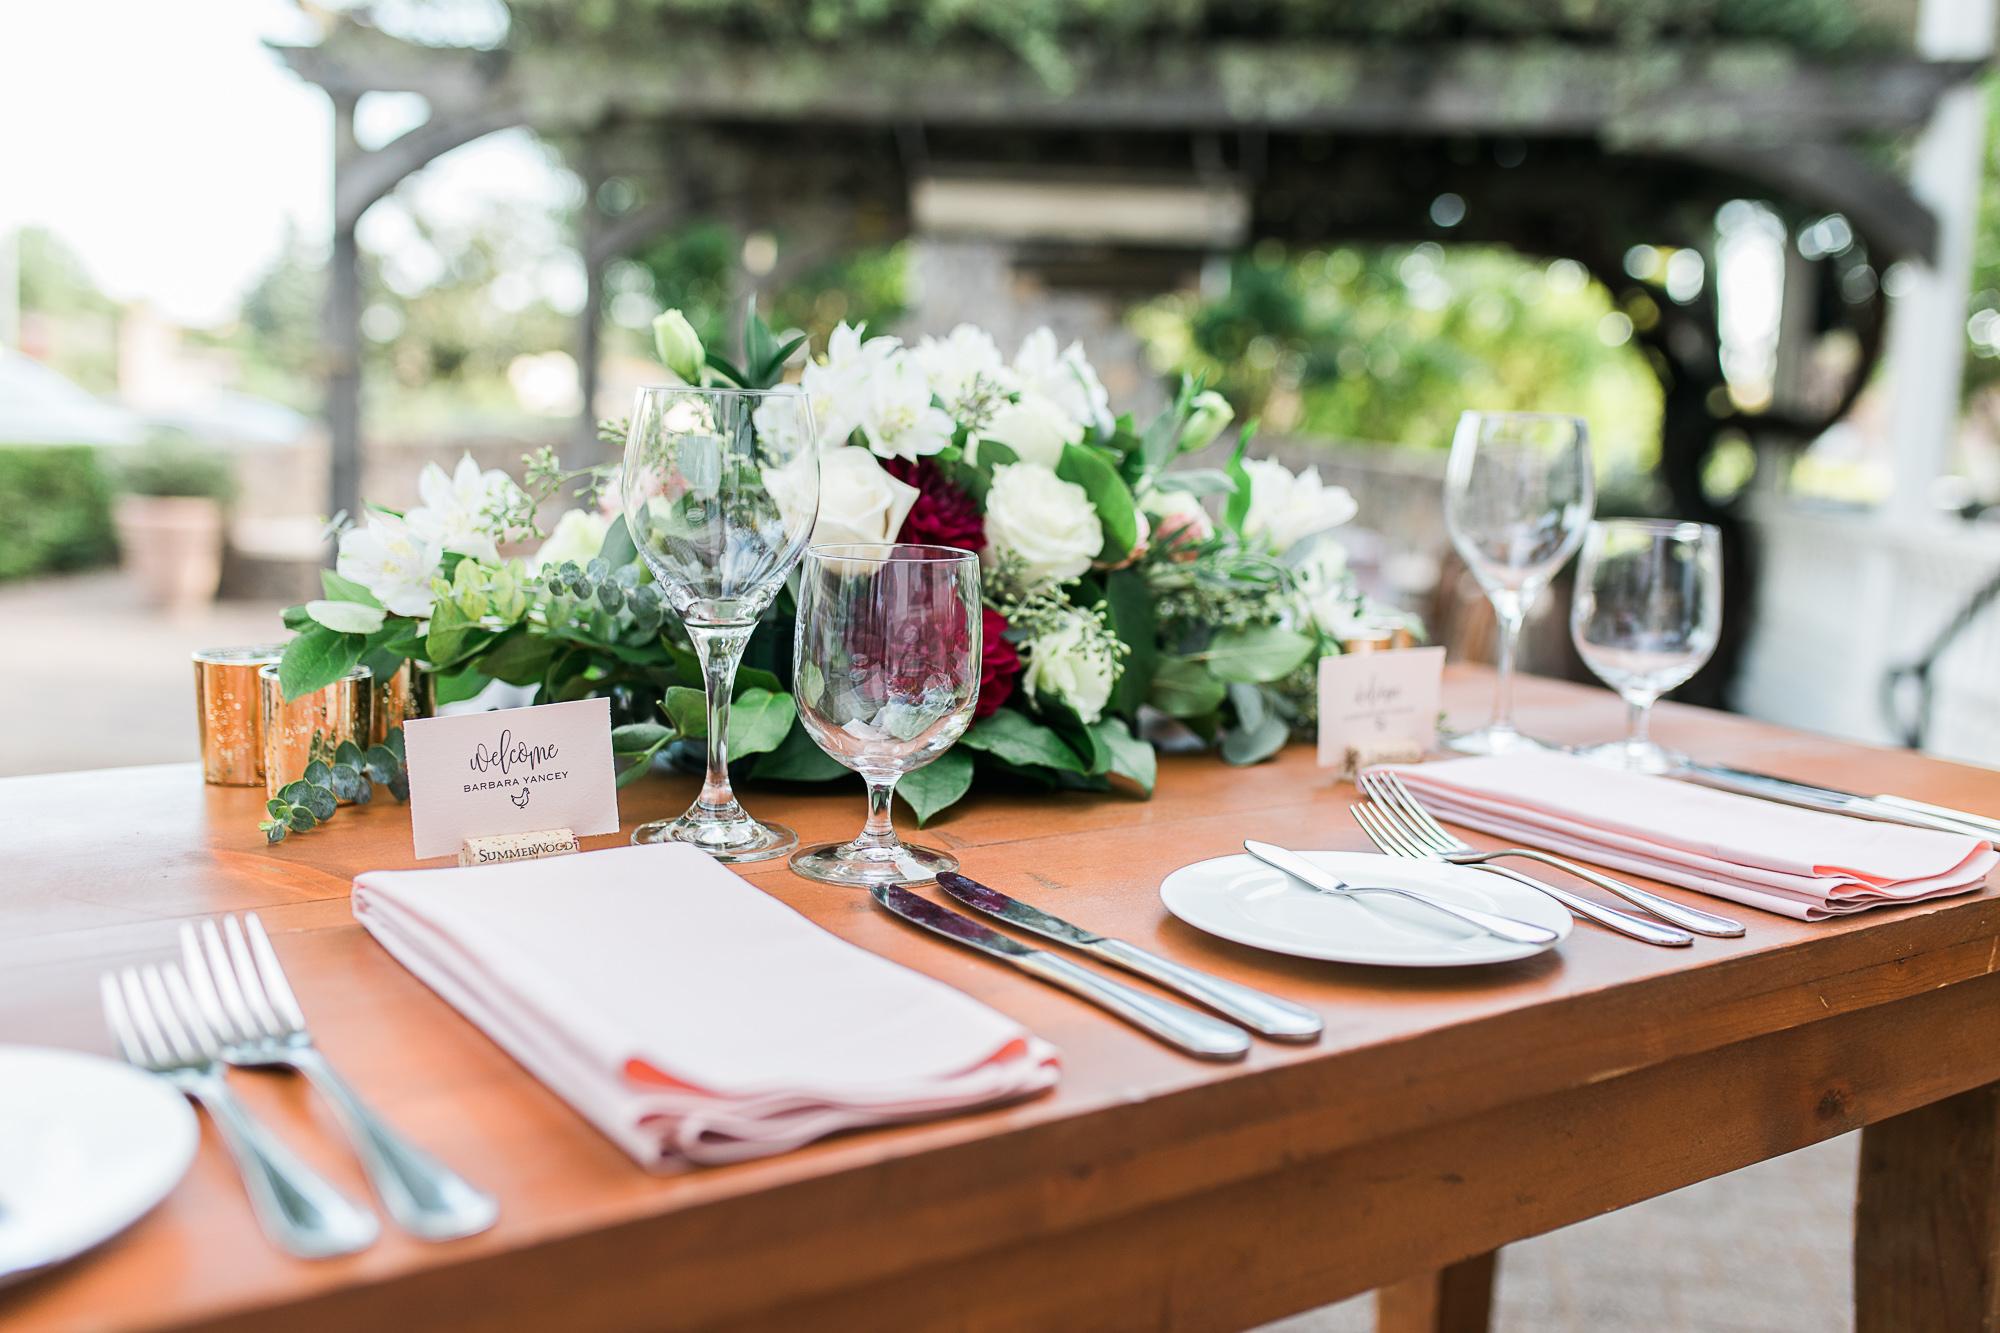 Generals+Daughter+Wedding+Photos+by+JBJ+Pictures+-+Ramekins+Wedding+Venue+Photographer+in+Sonoma+Napa+(22).jpg